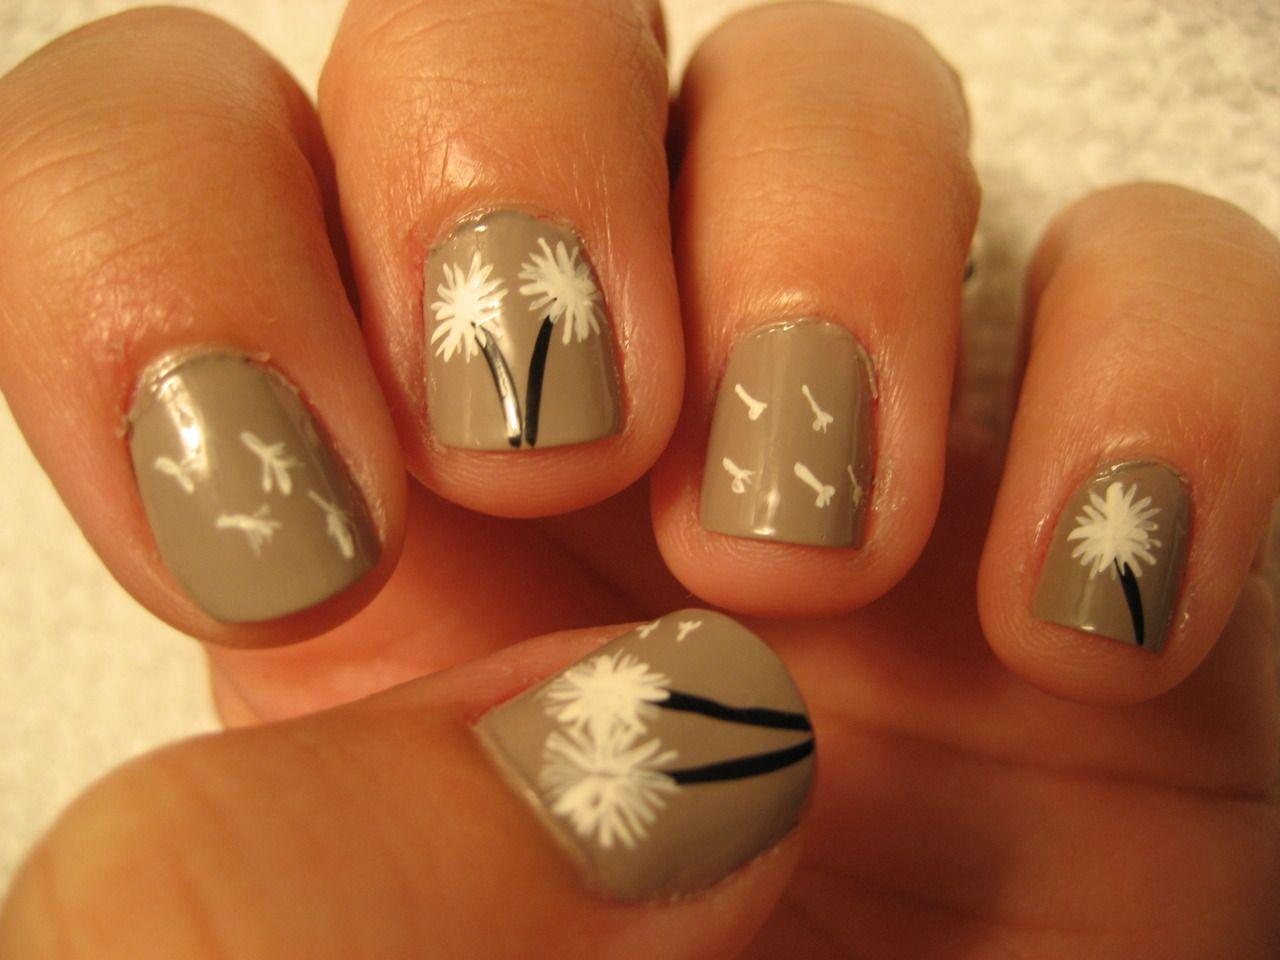 cute dandelion nails :)